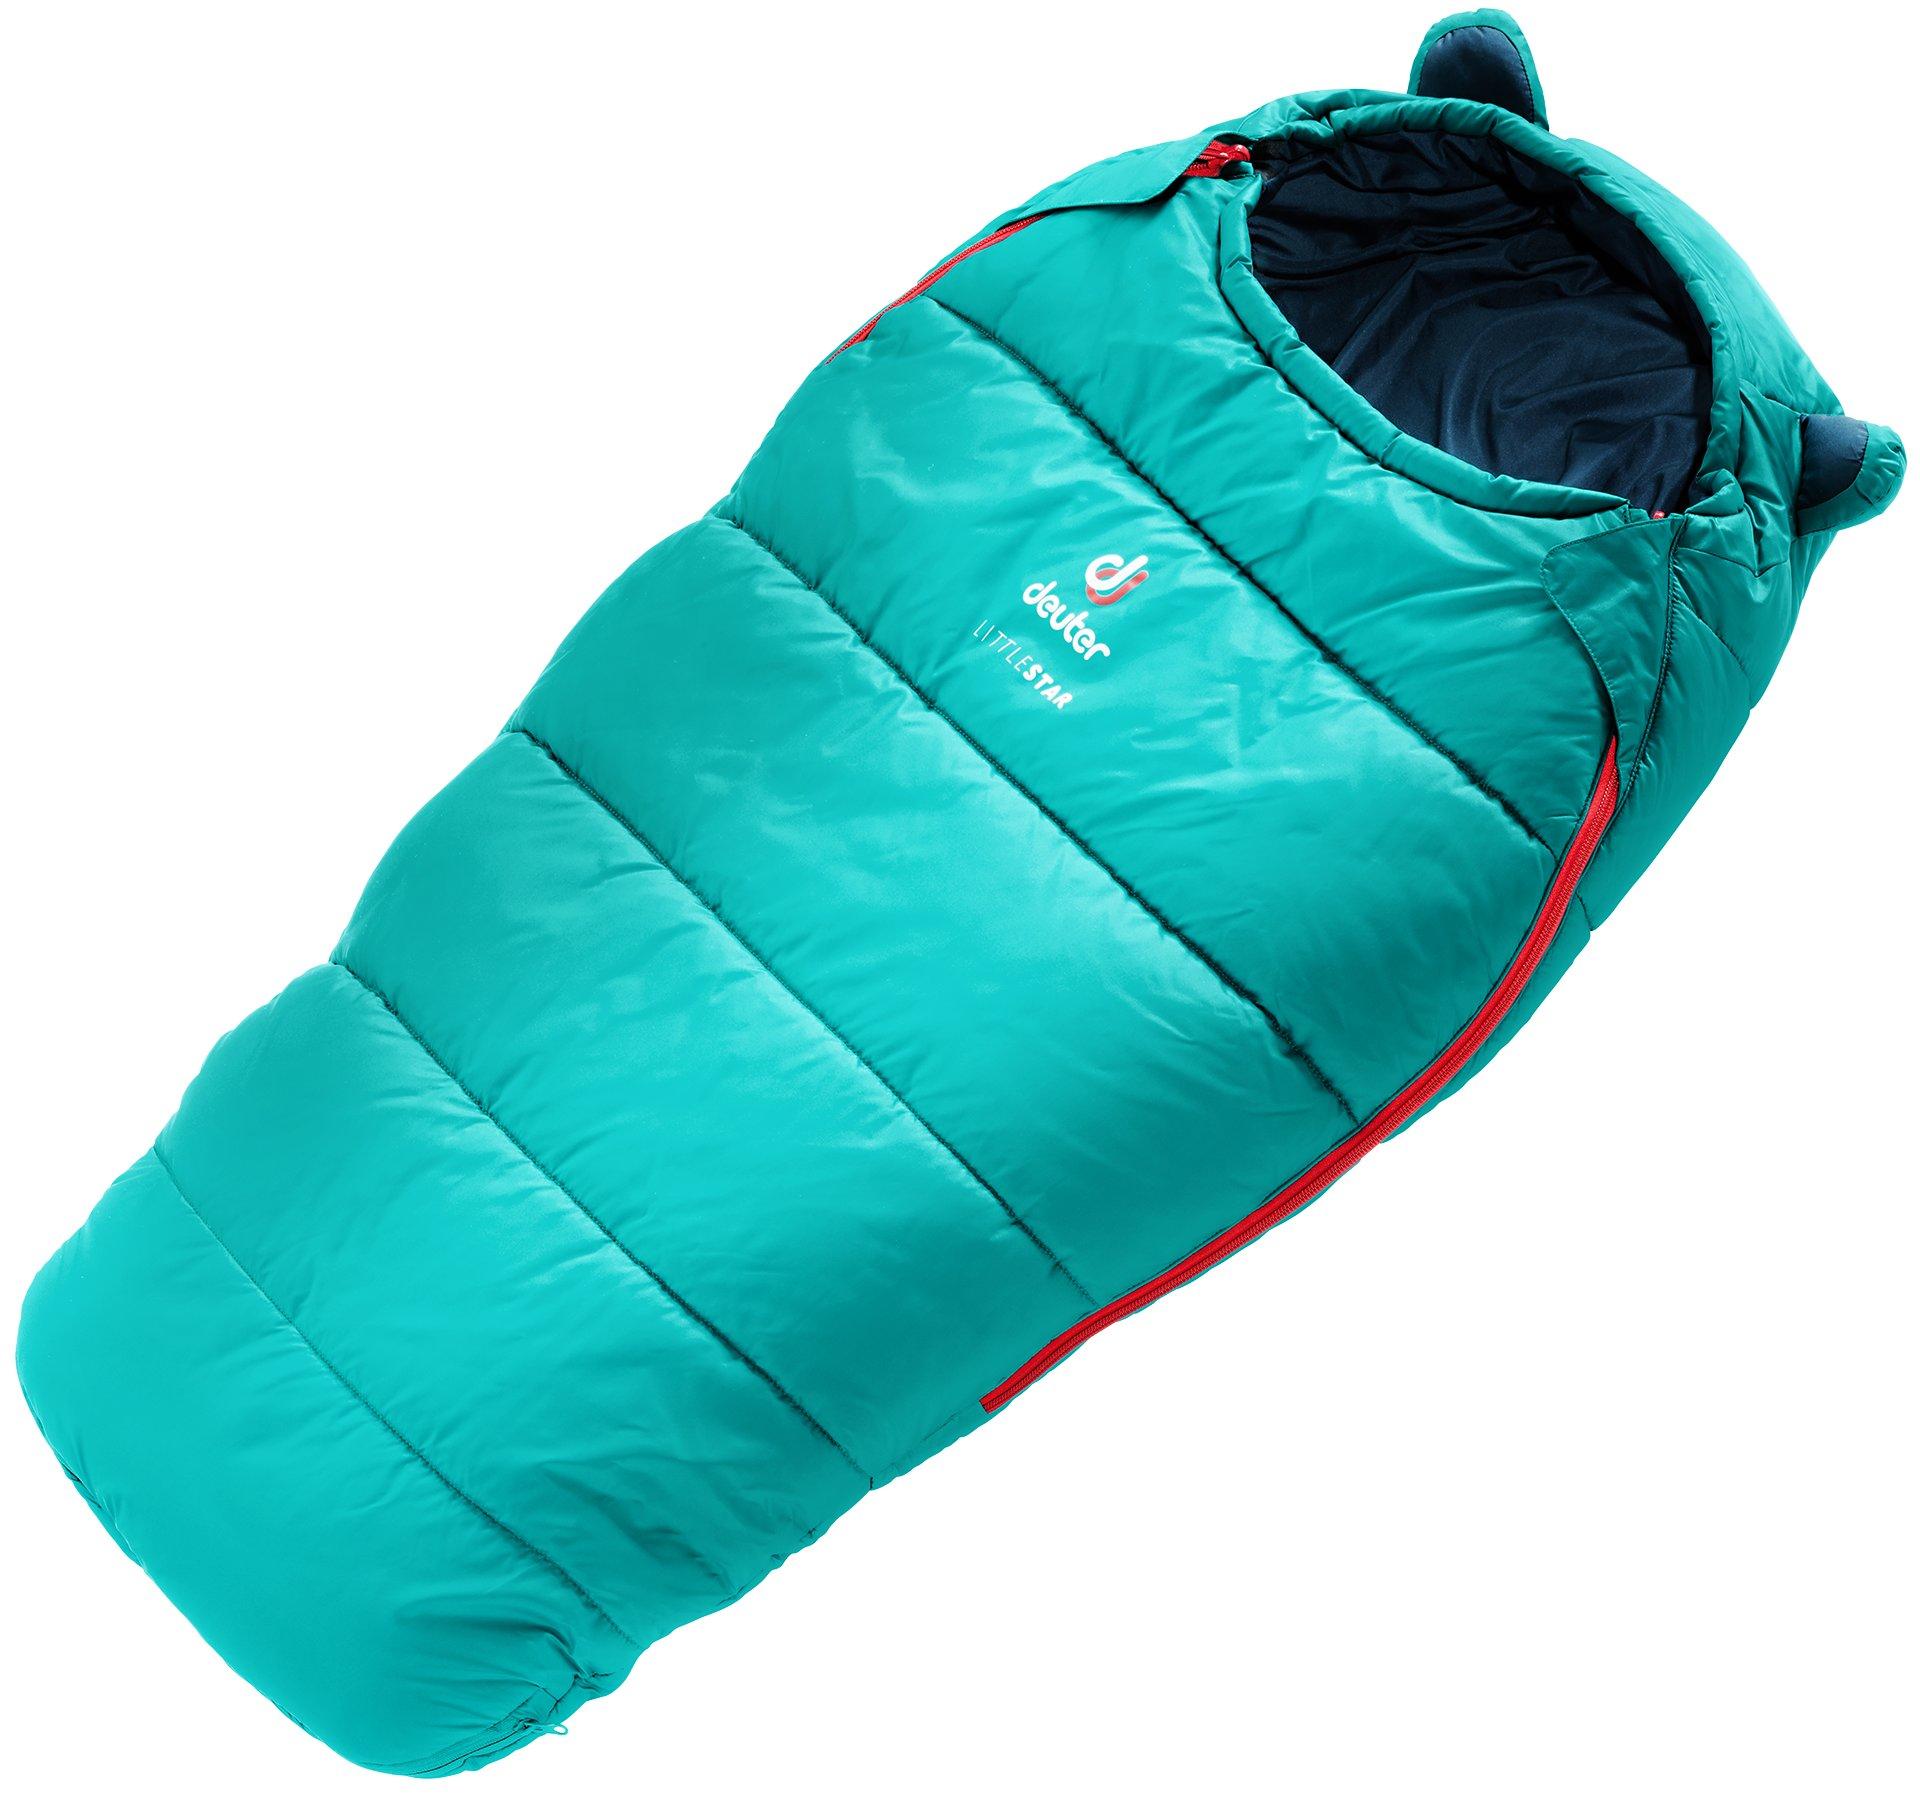 Deuter - Little Star, Kinderschlafsack